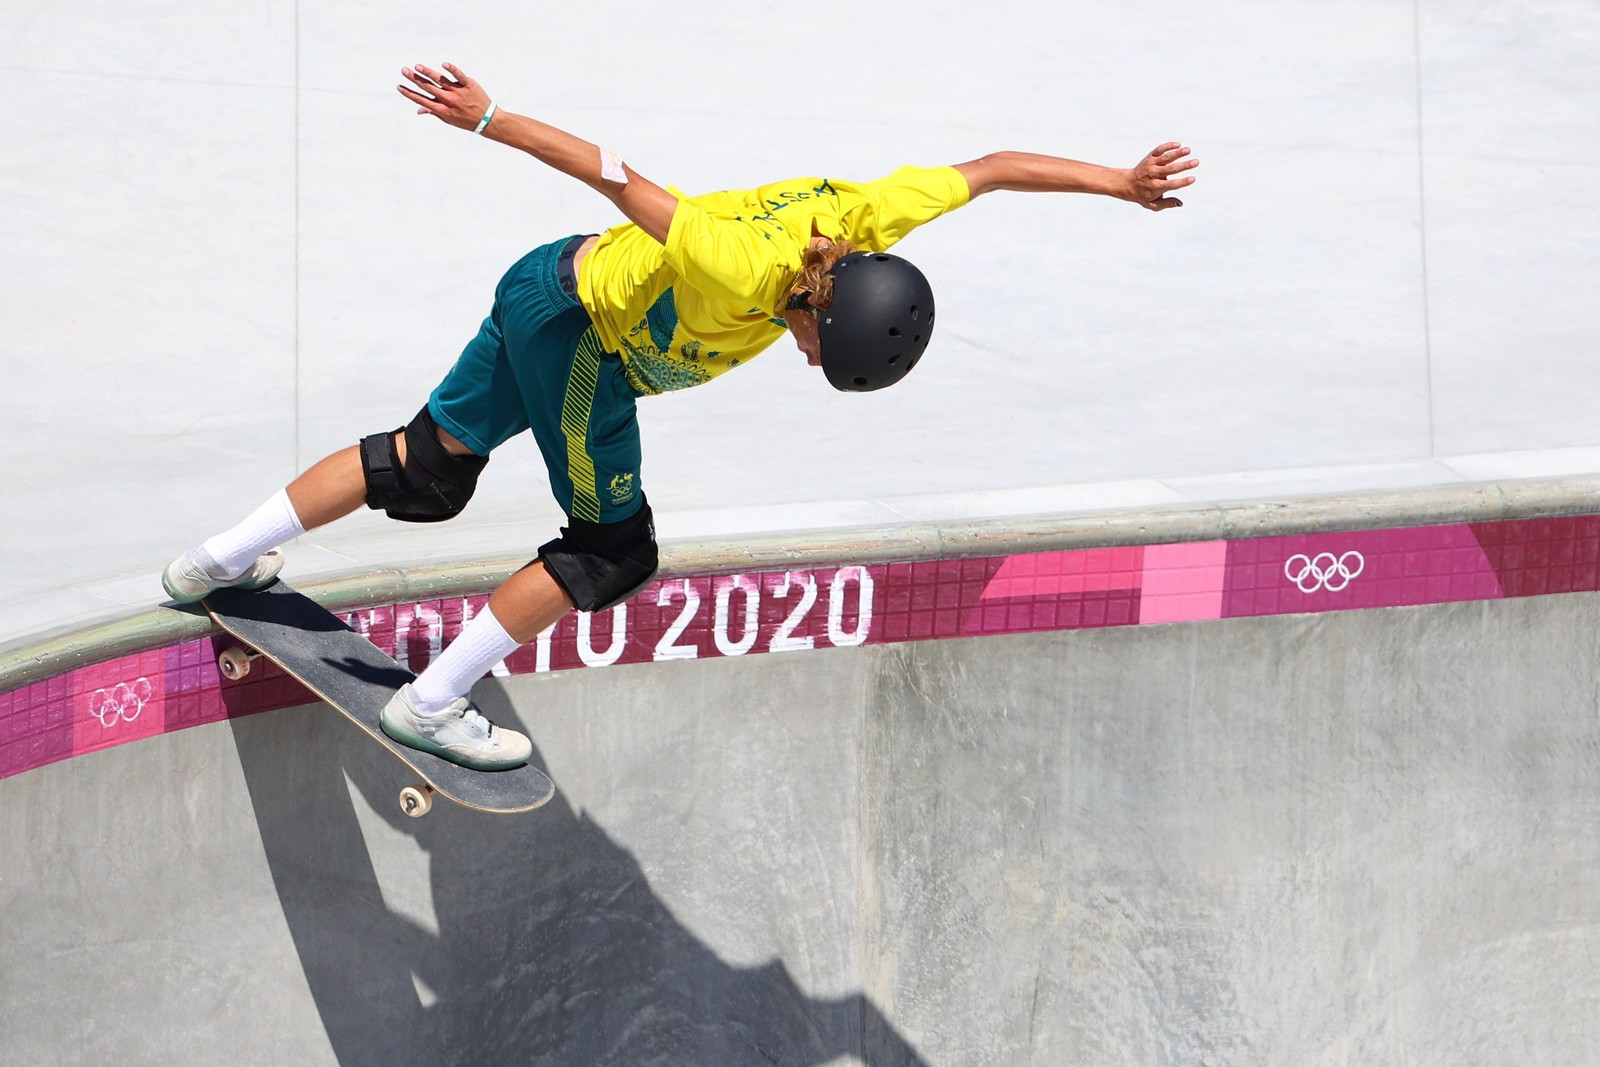 Australia's Keegan Palmer Wins Olympic Men's Park Skateboarding Gold